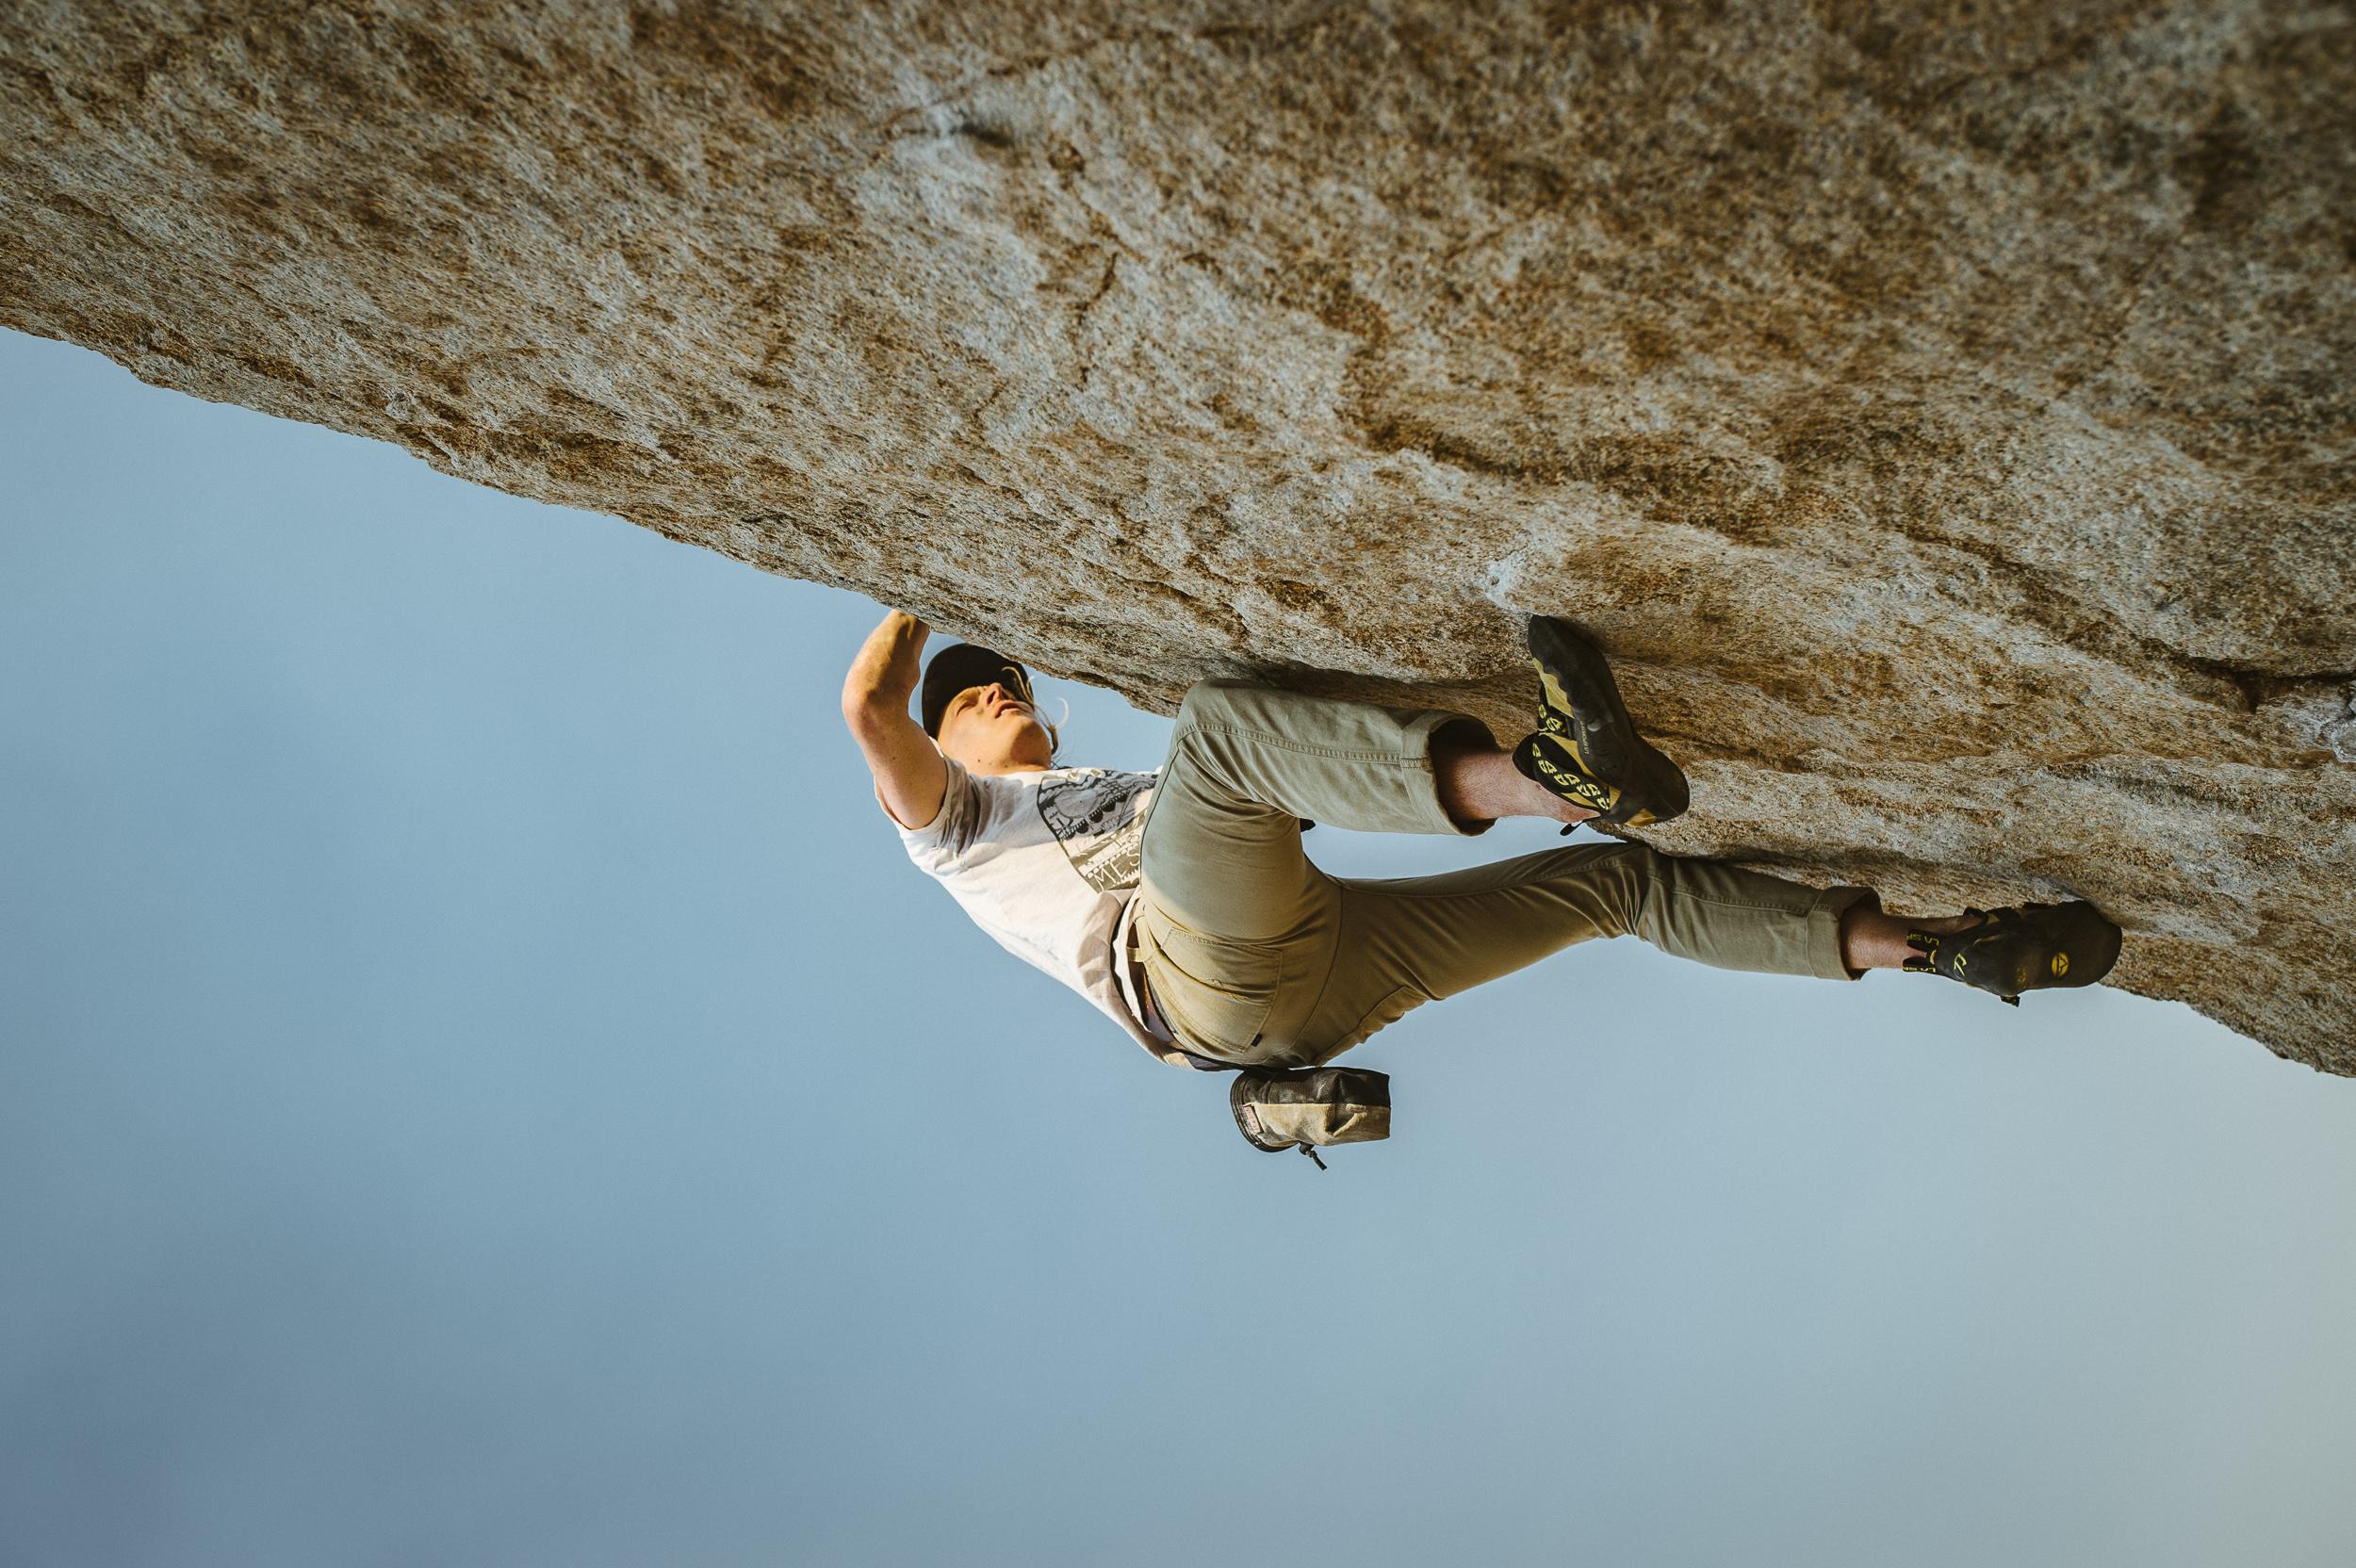 Rock climbing at Mammoth Lakes | G-Project Gear